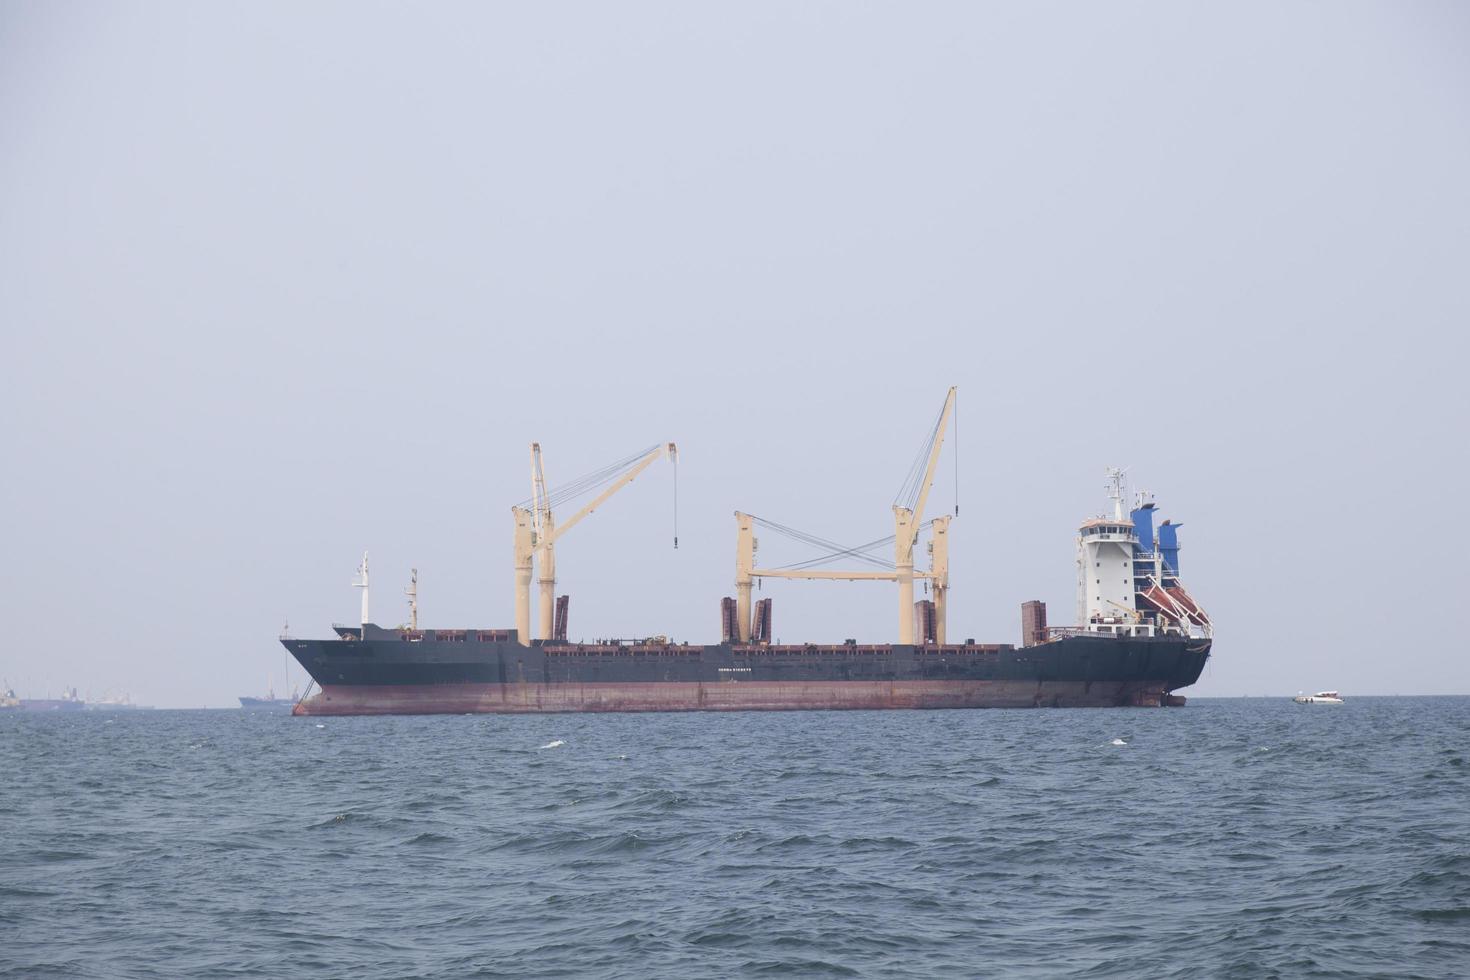 großes Frachtschiff auf dem Meer foto